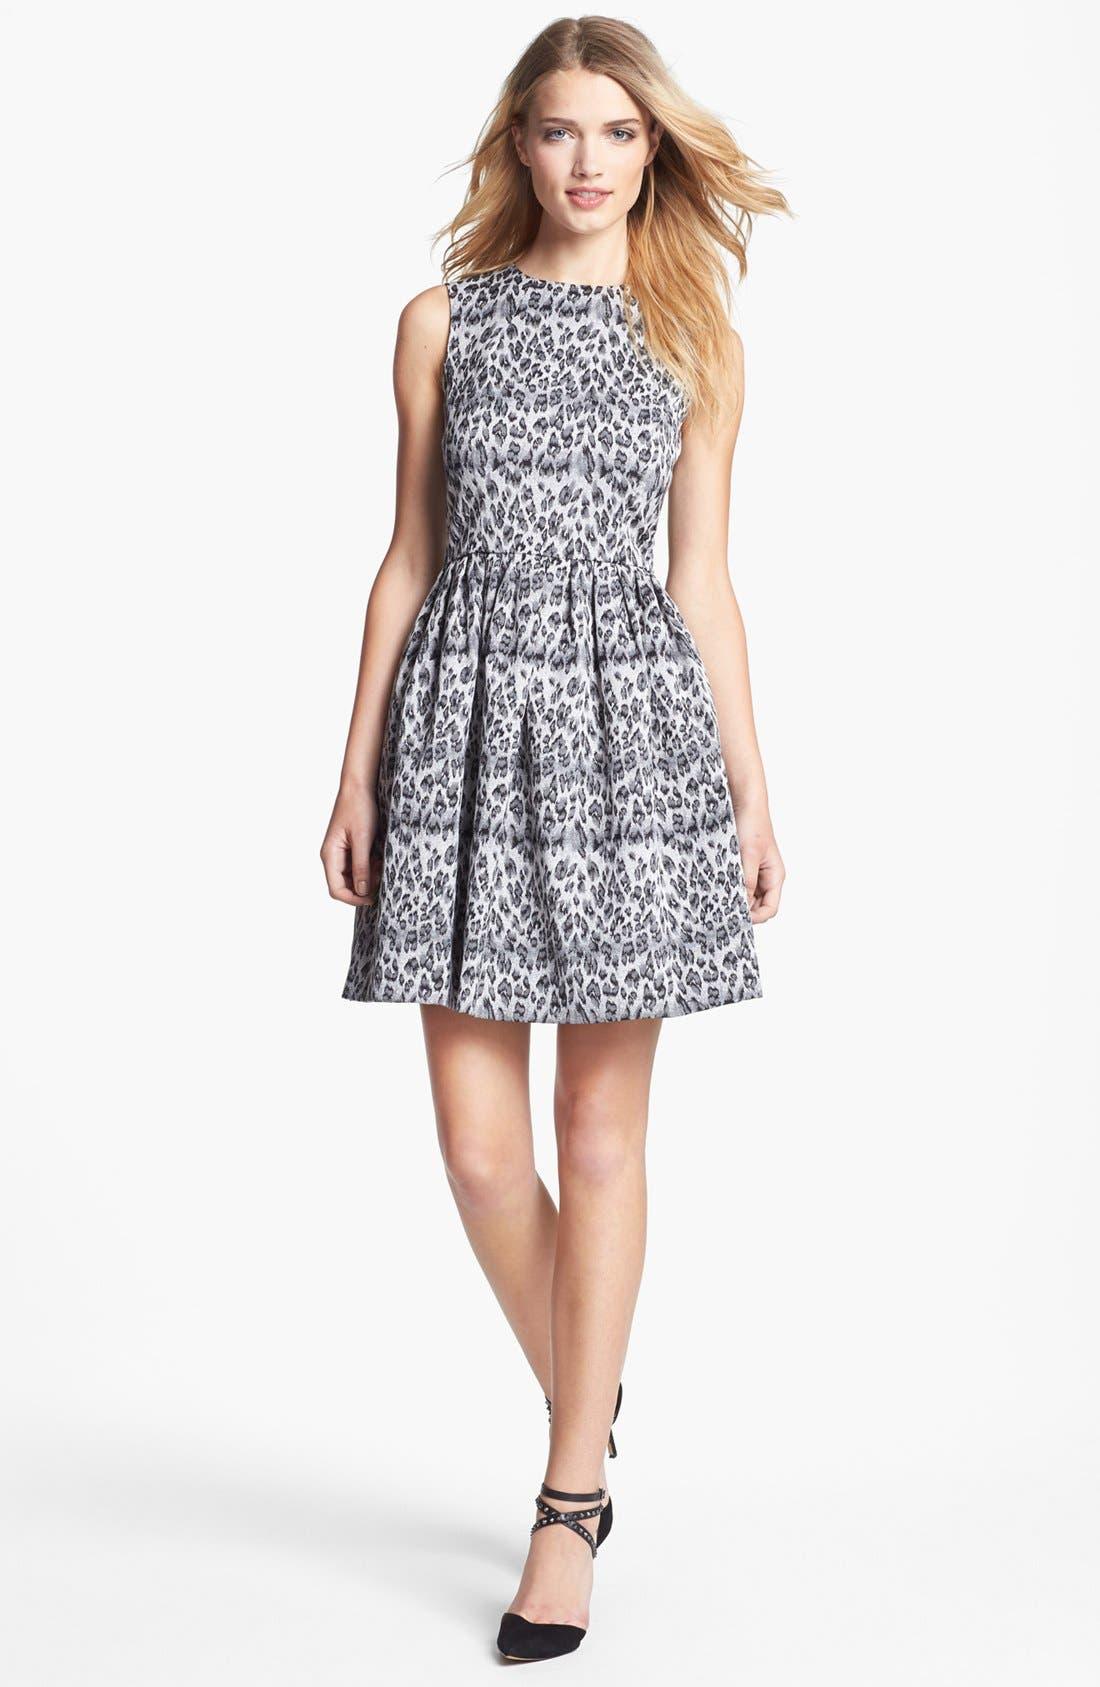 Alternate Image 1 Selected - Taylor Dresses Sleeveless Jacquard Fit & Flare Dress (Regular & Petite)